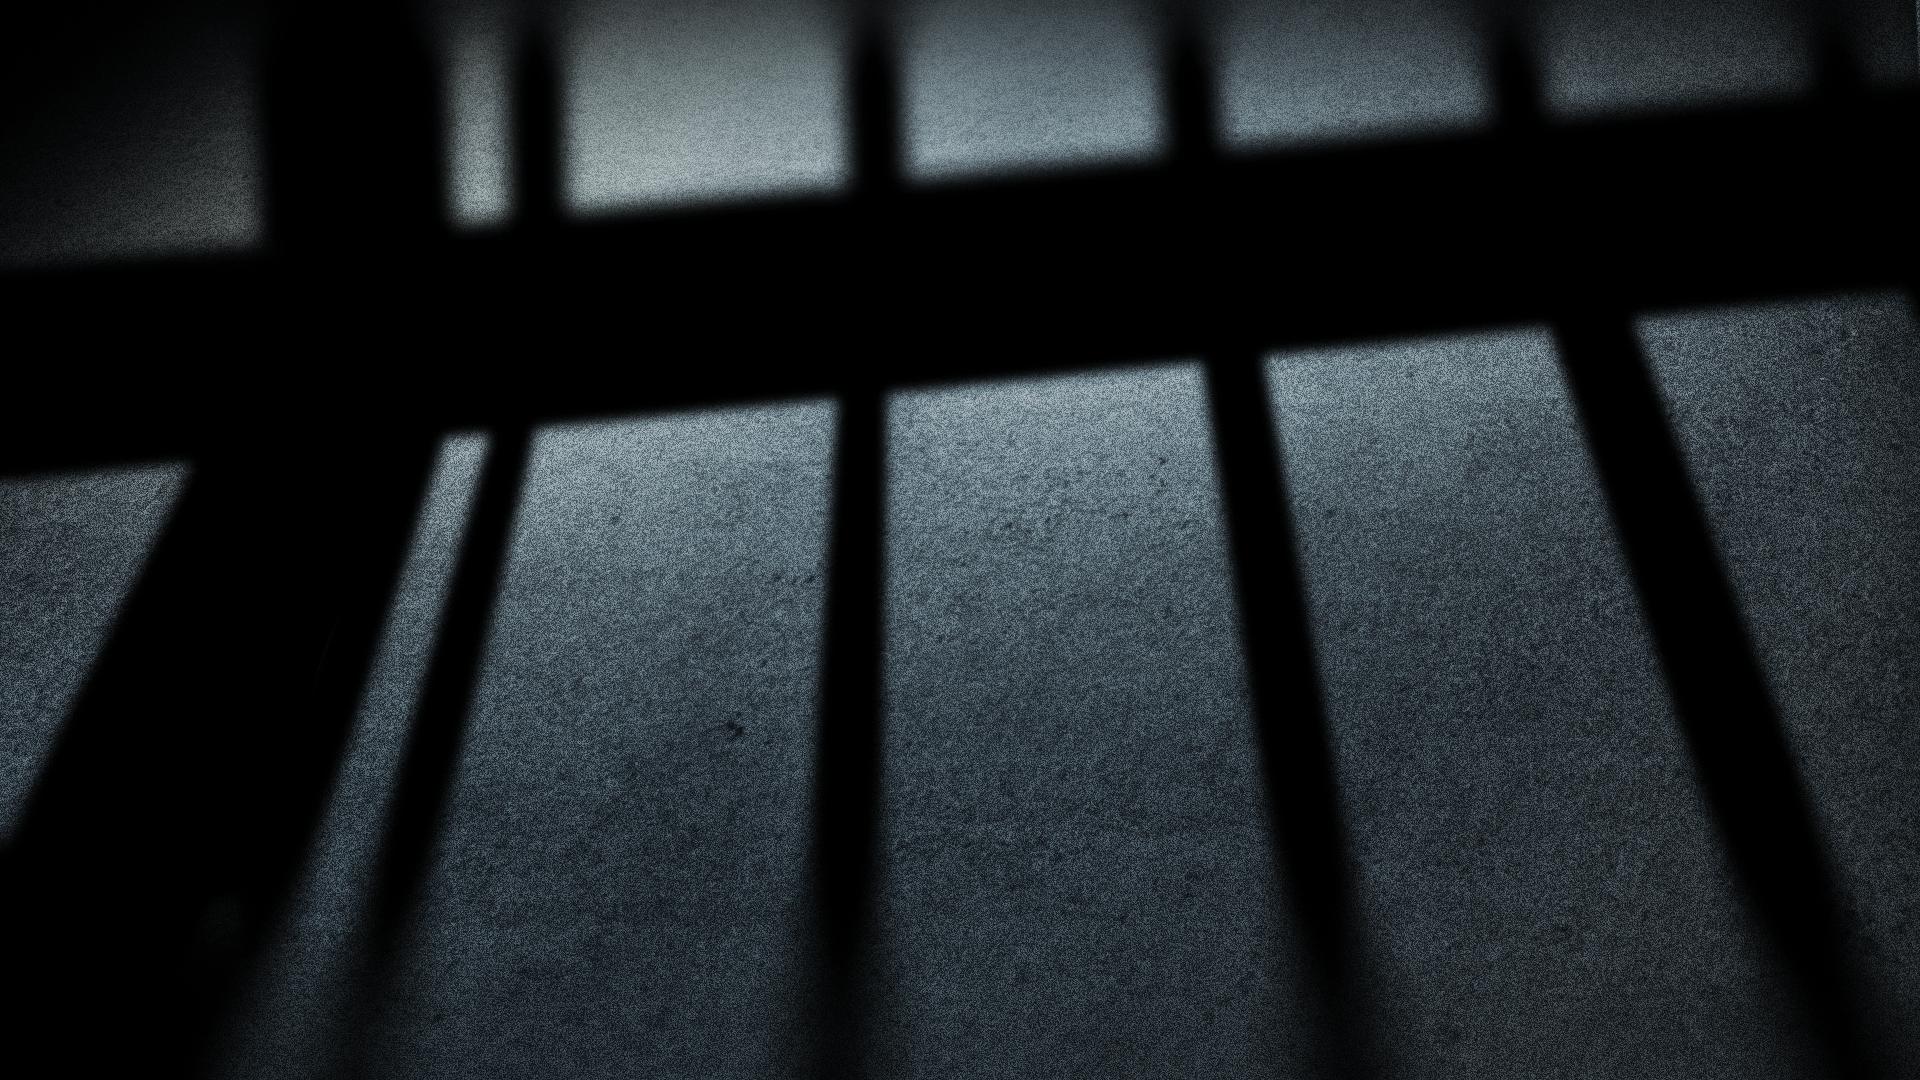 jail prison bars crime court sentencing graphic